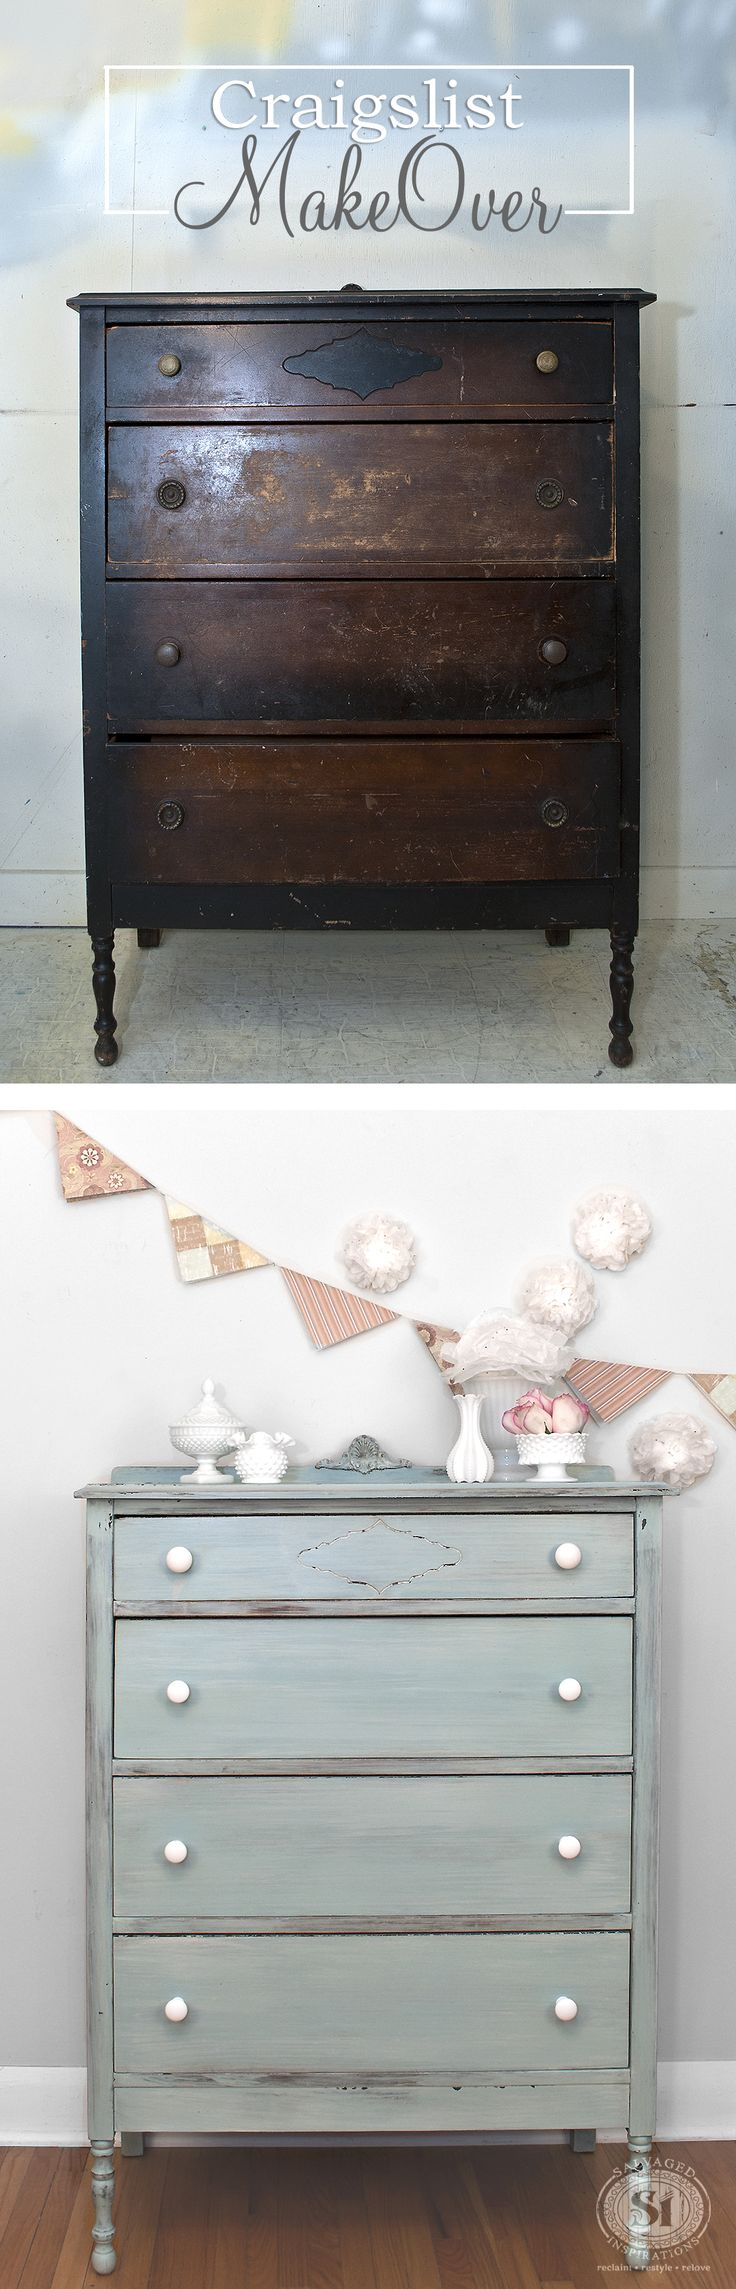 Painted furniture ideas before and after - Before After Craigslist Vintage Dresser Makeover